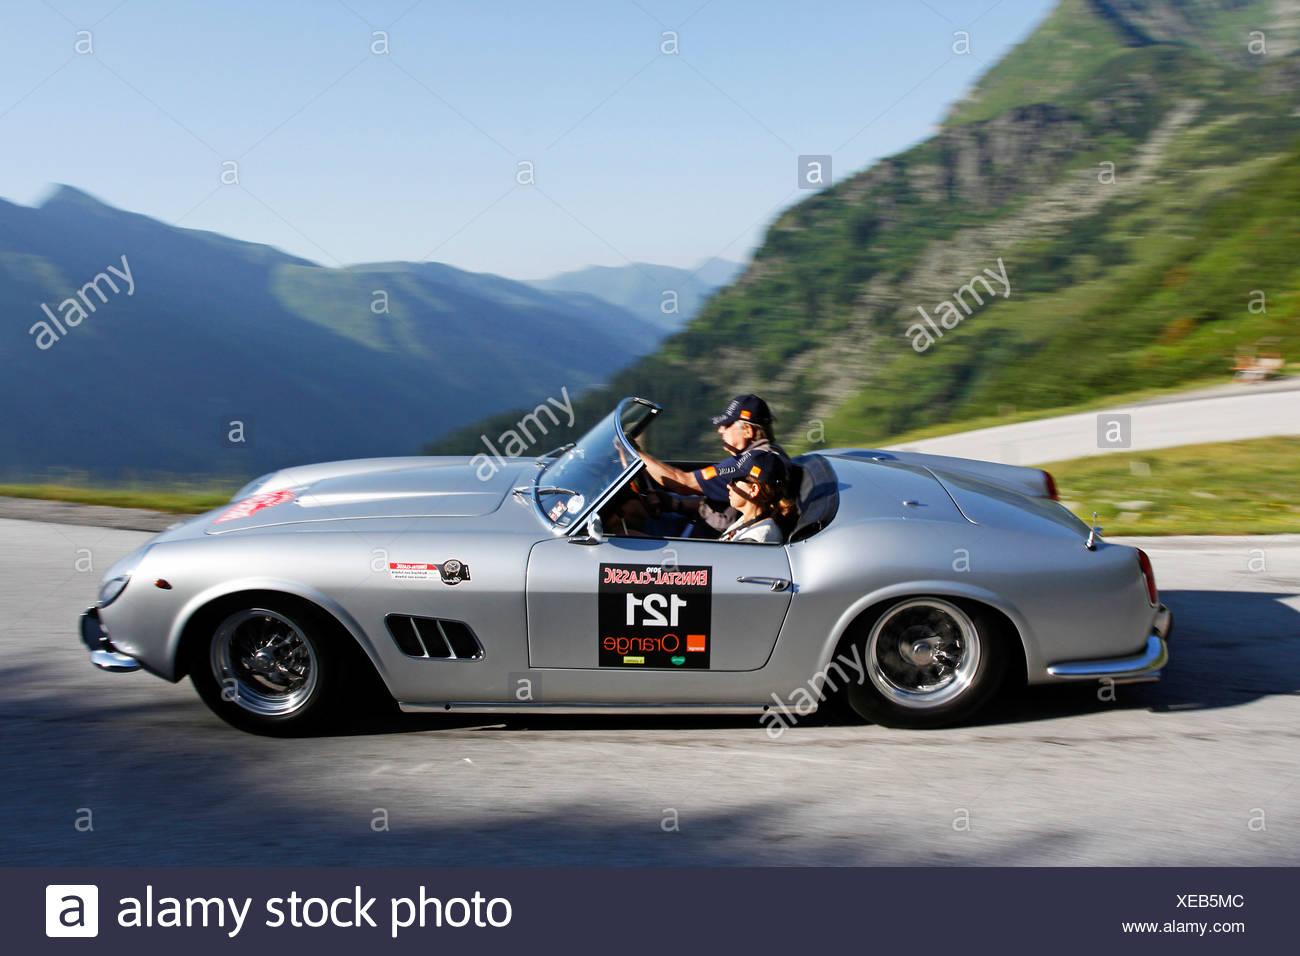 Ferrari 250 Gt Swb California Spyder Construido En 1961 Uno De Los Mas Caros De Ferrari Solo 51 Unidades Fueron Construidas Soelkpass Fotografia De Stock Alamy